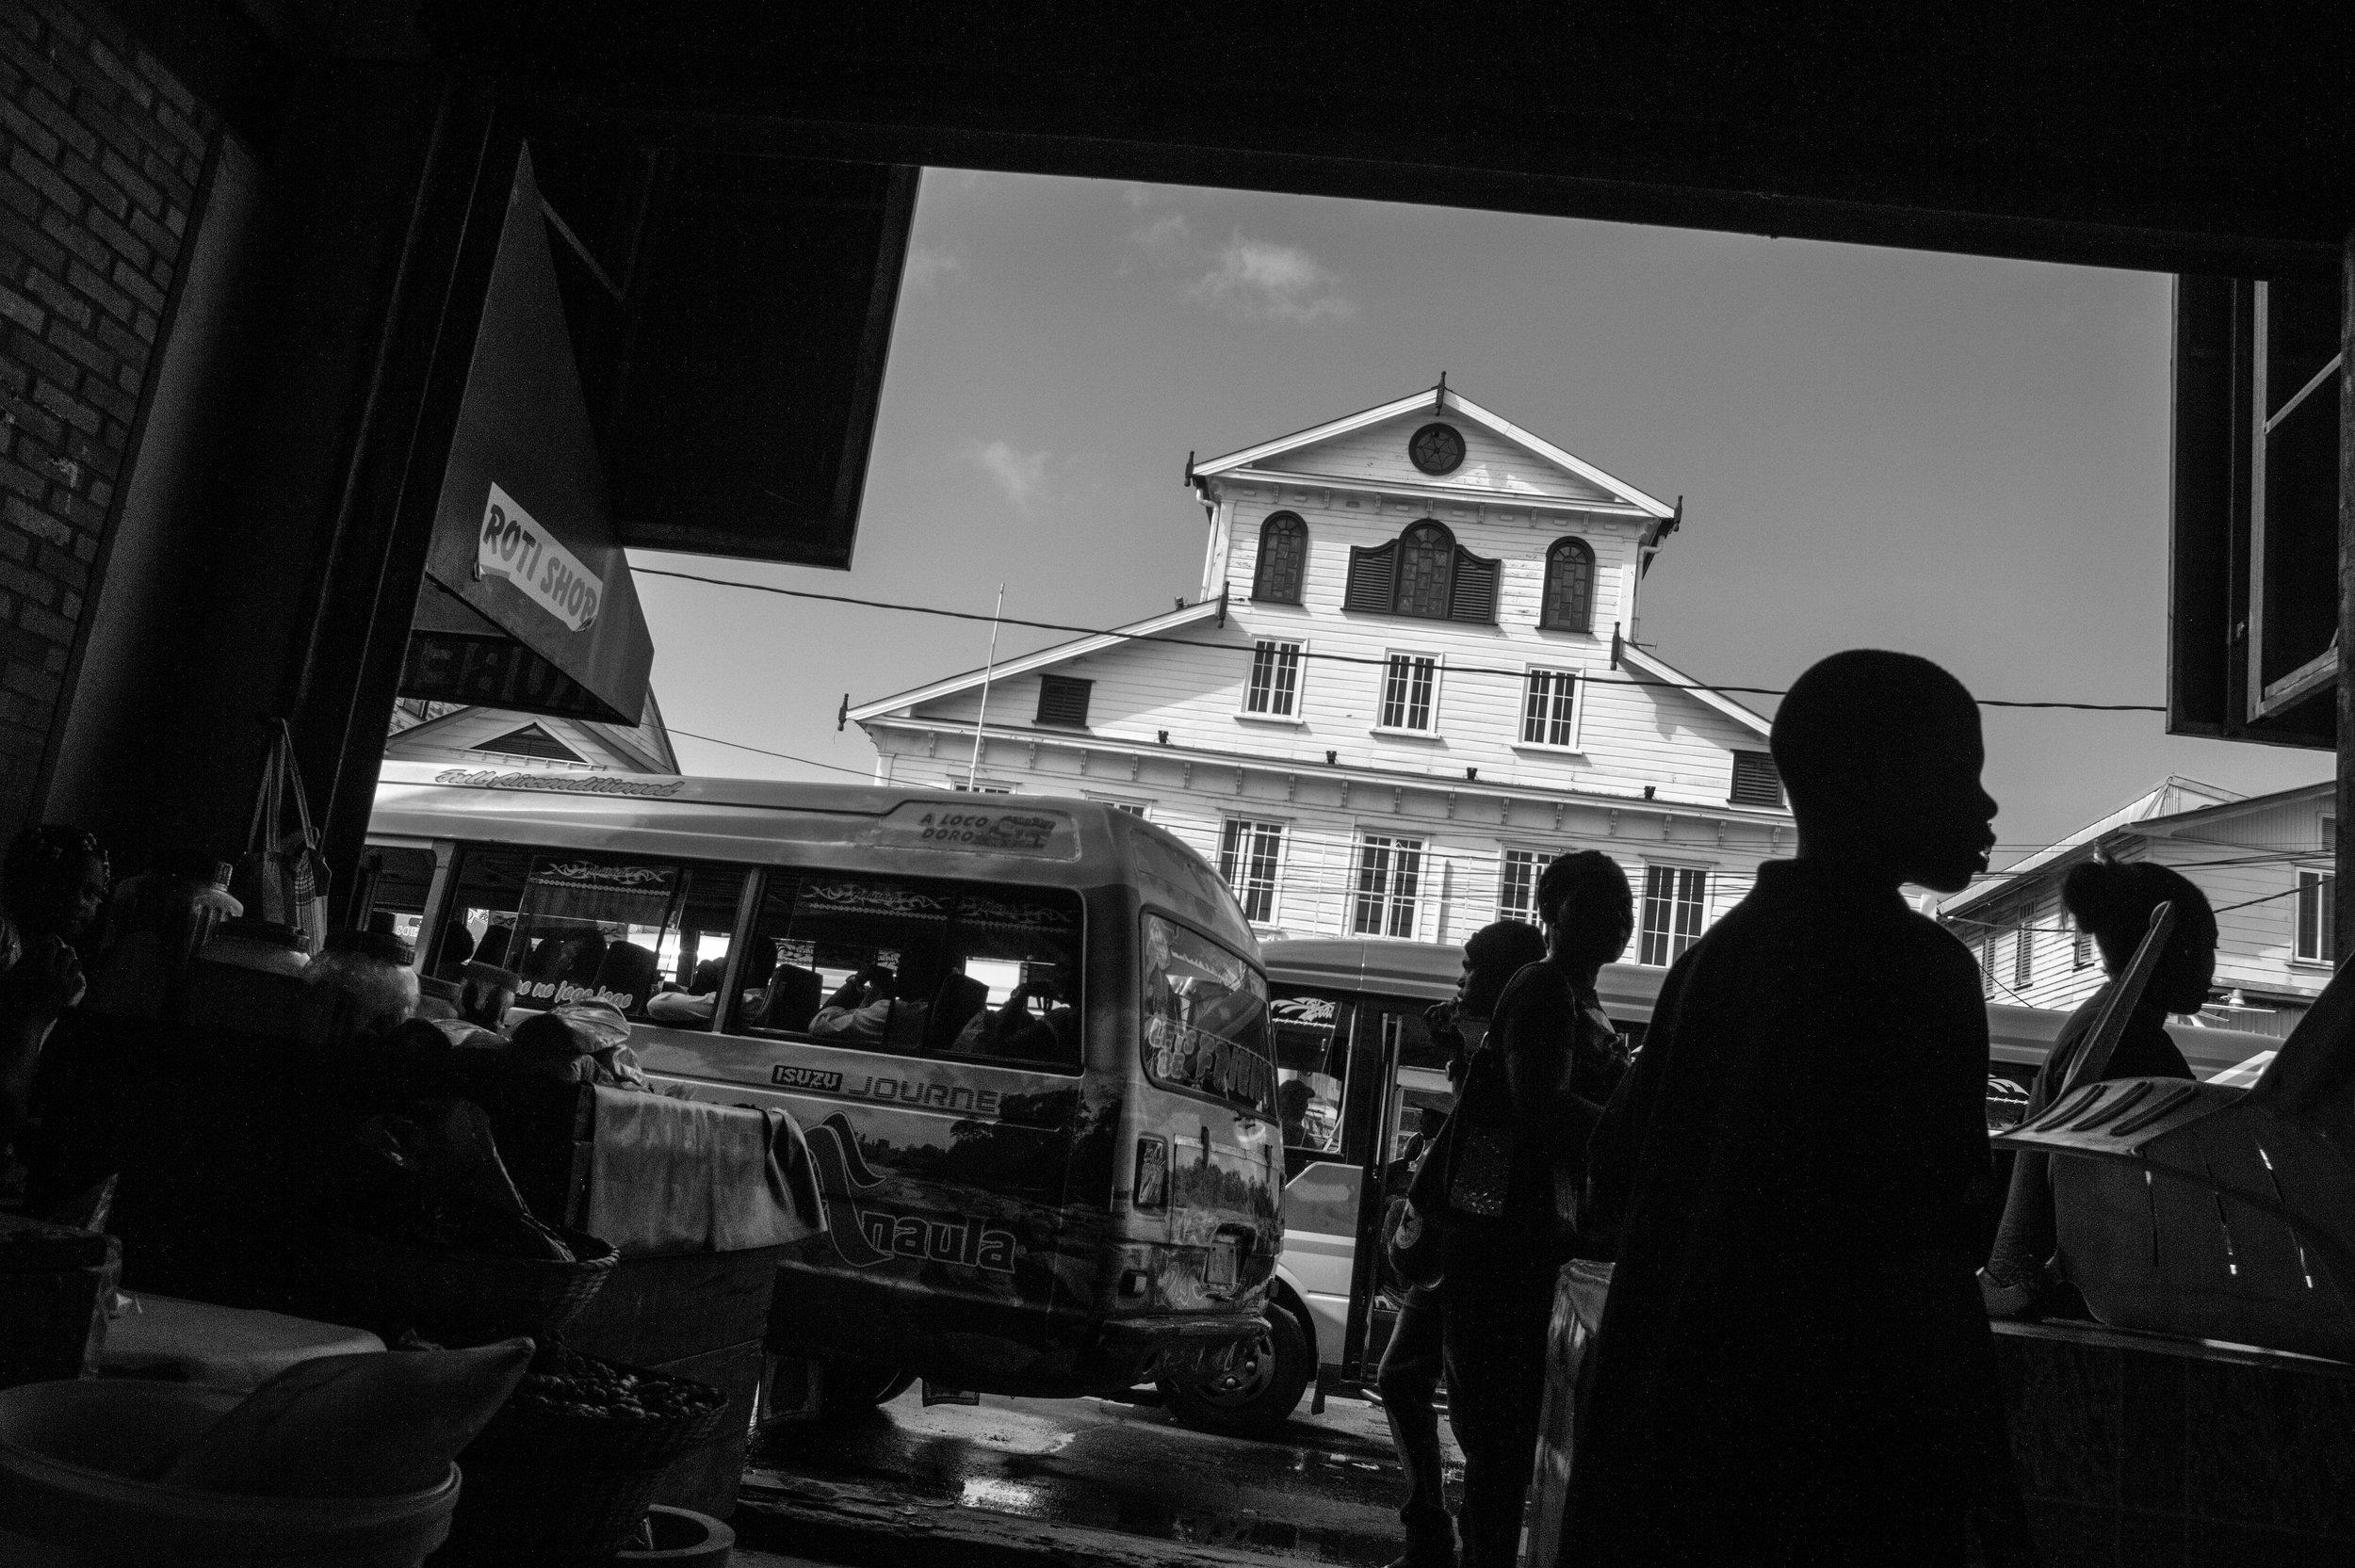 Georgetown, Guyana